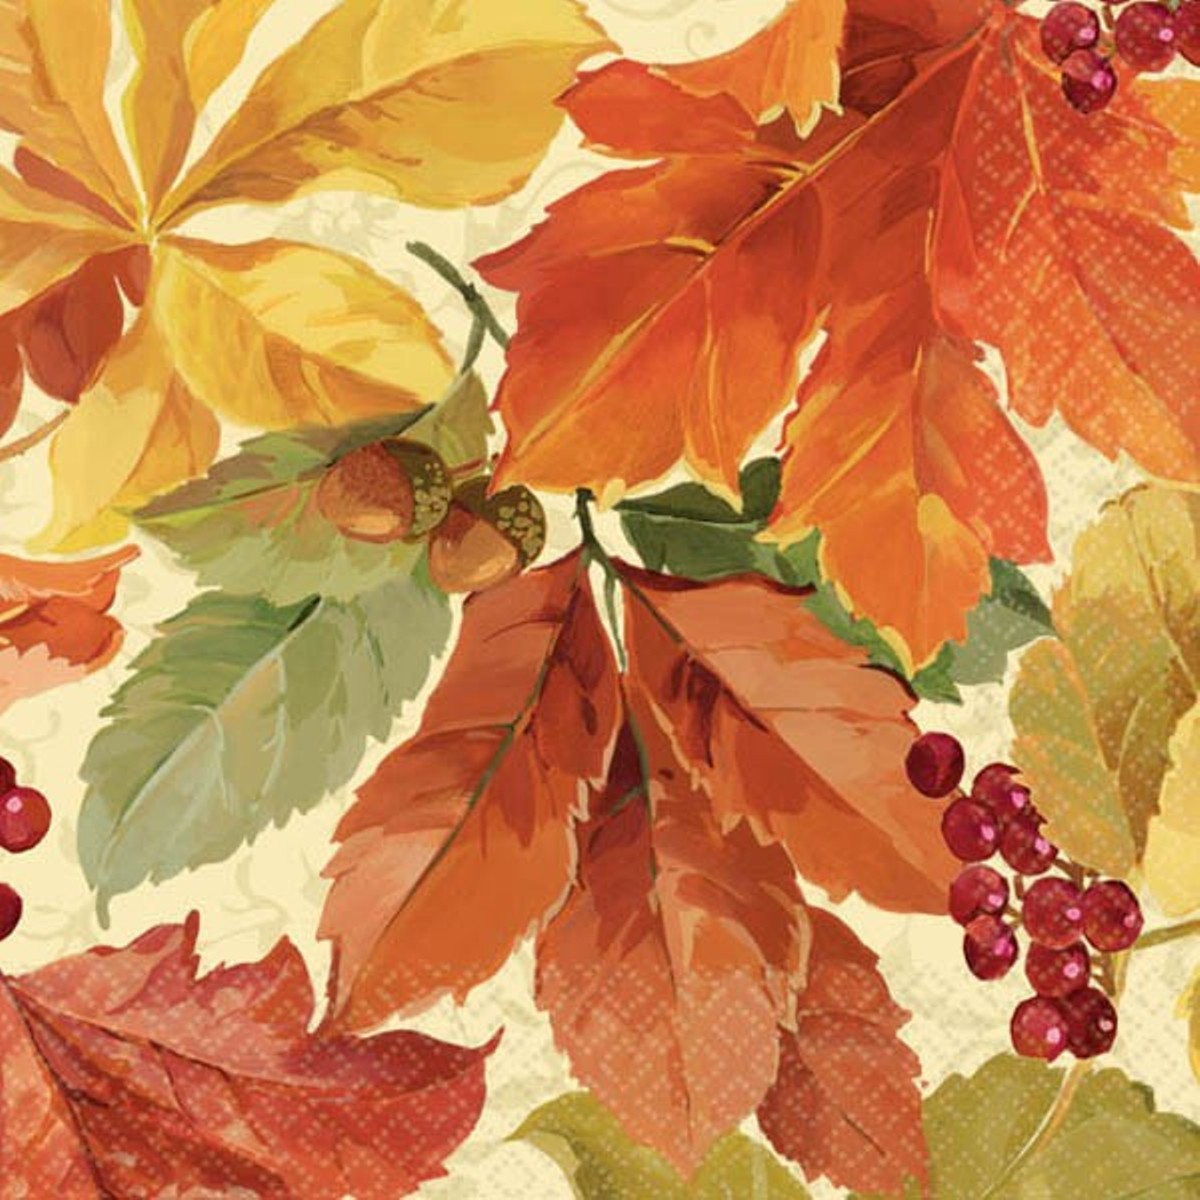 Elegant Leaves 16 Beverage Napkins Fall Thanksgiving by Amscan